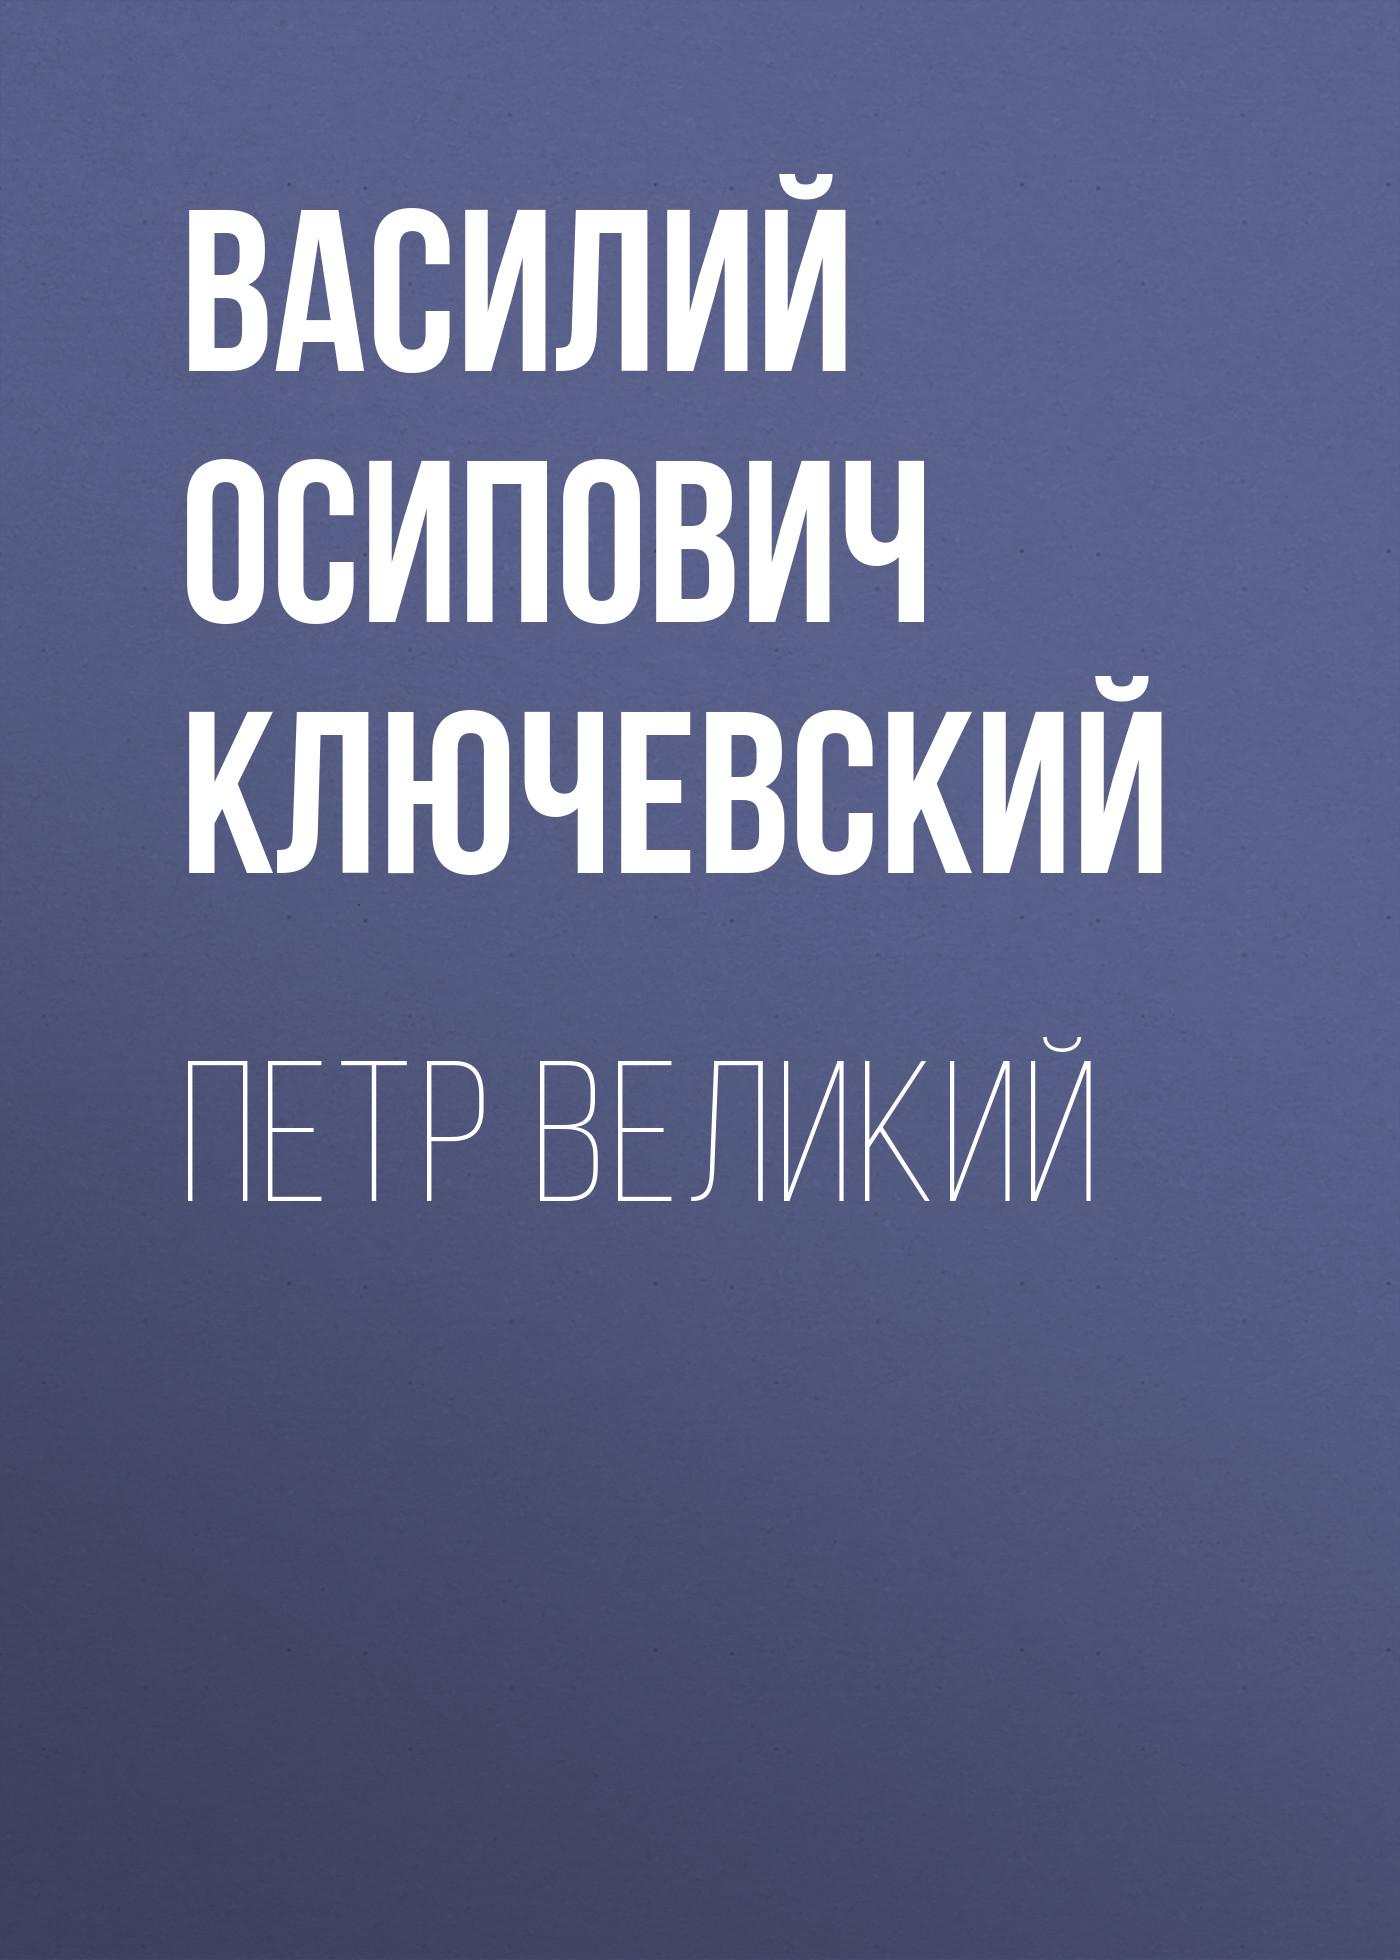 Фото - Василий Осипович Ключевский Петр Великий василий осипович ключевский петр ii